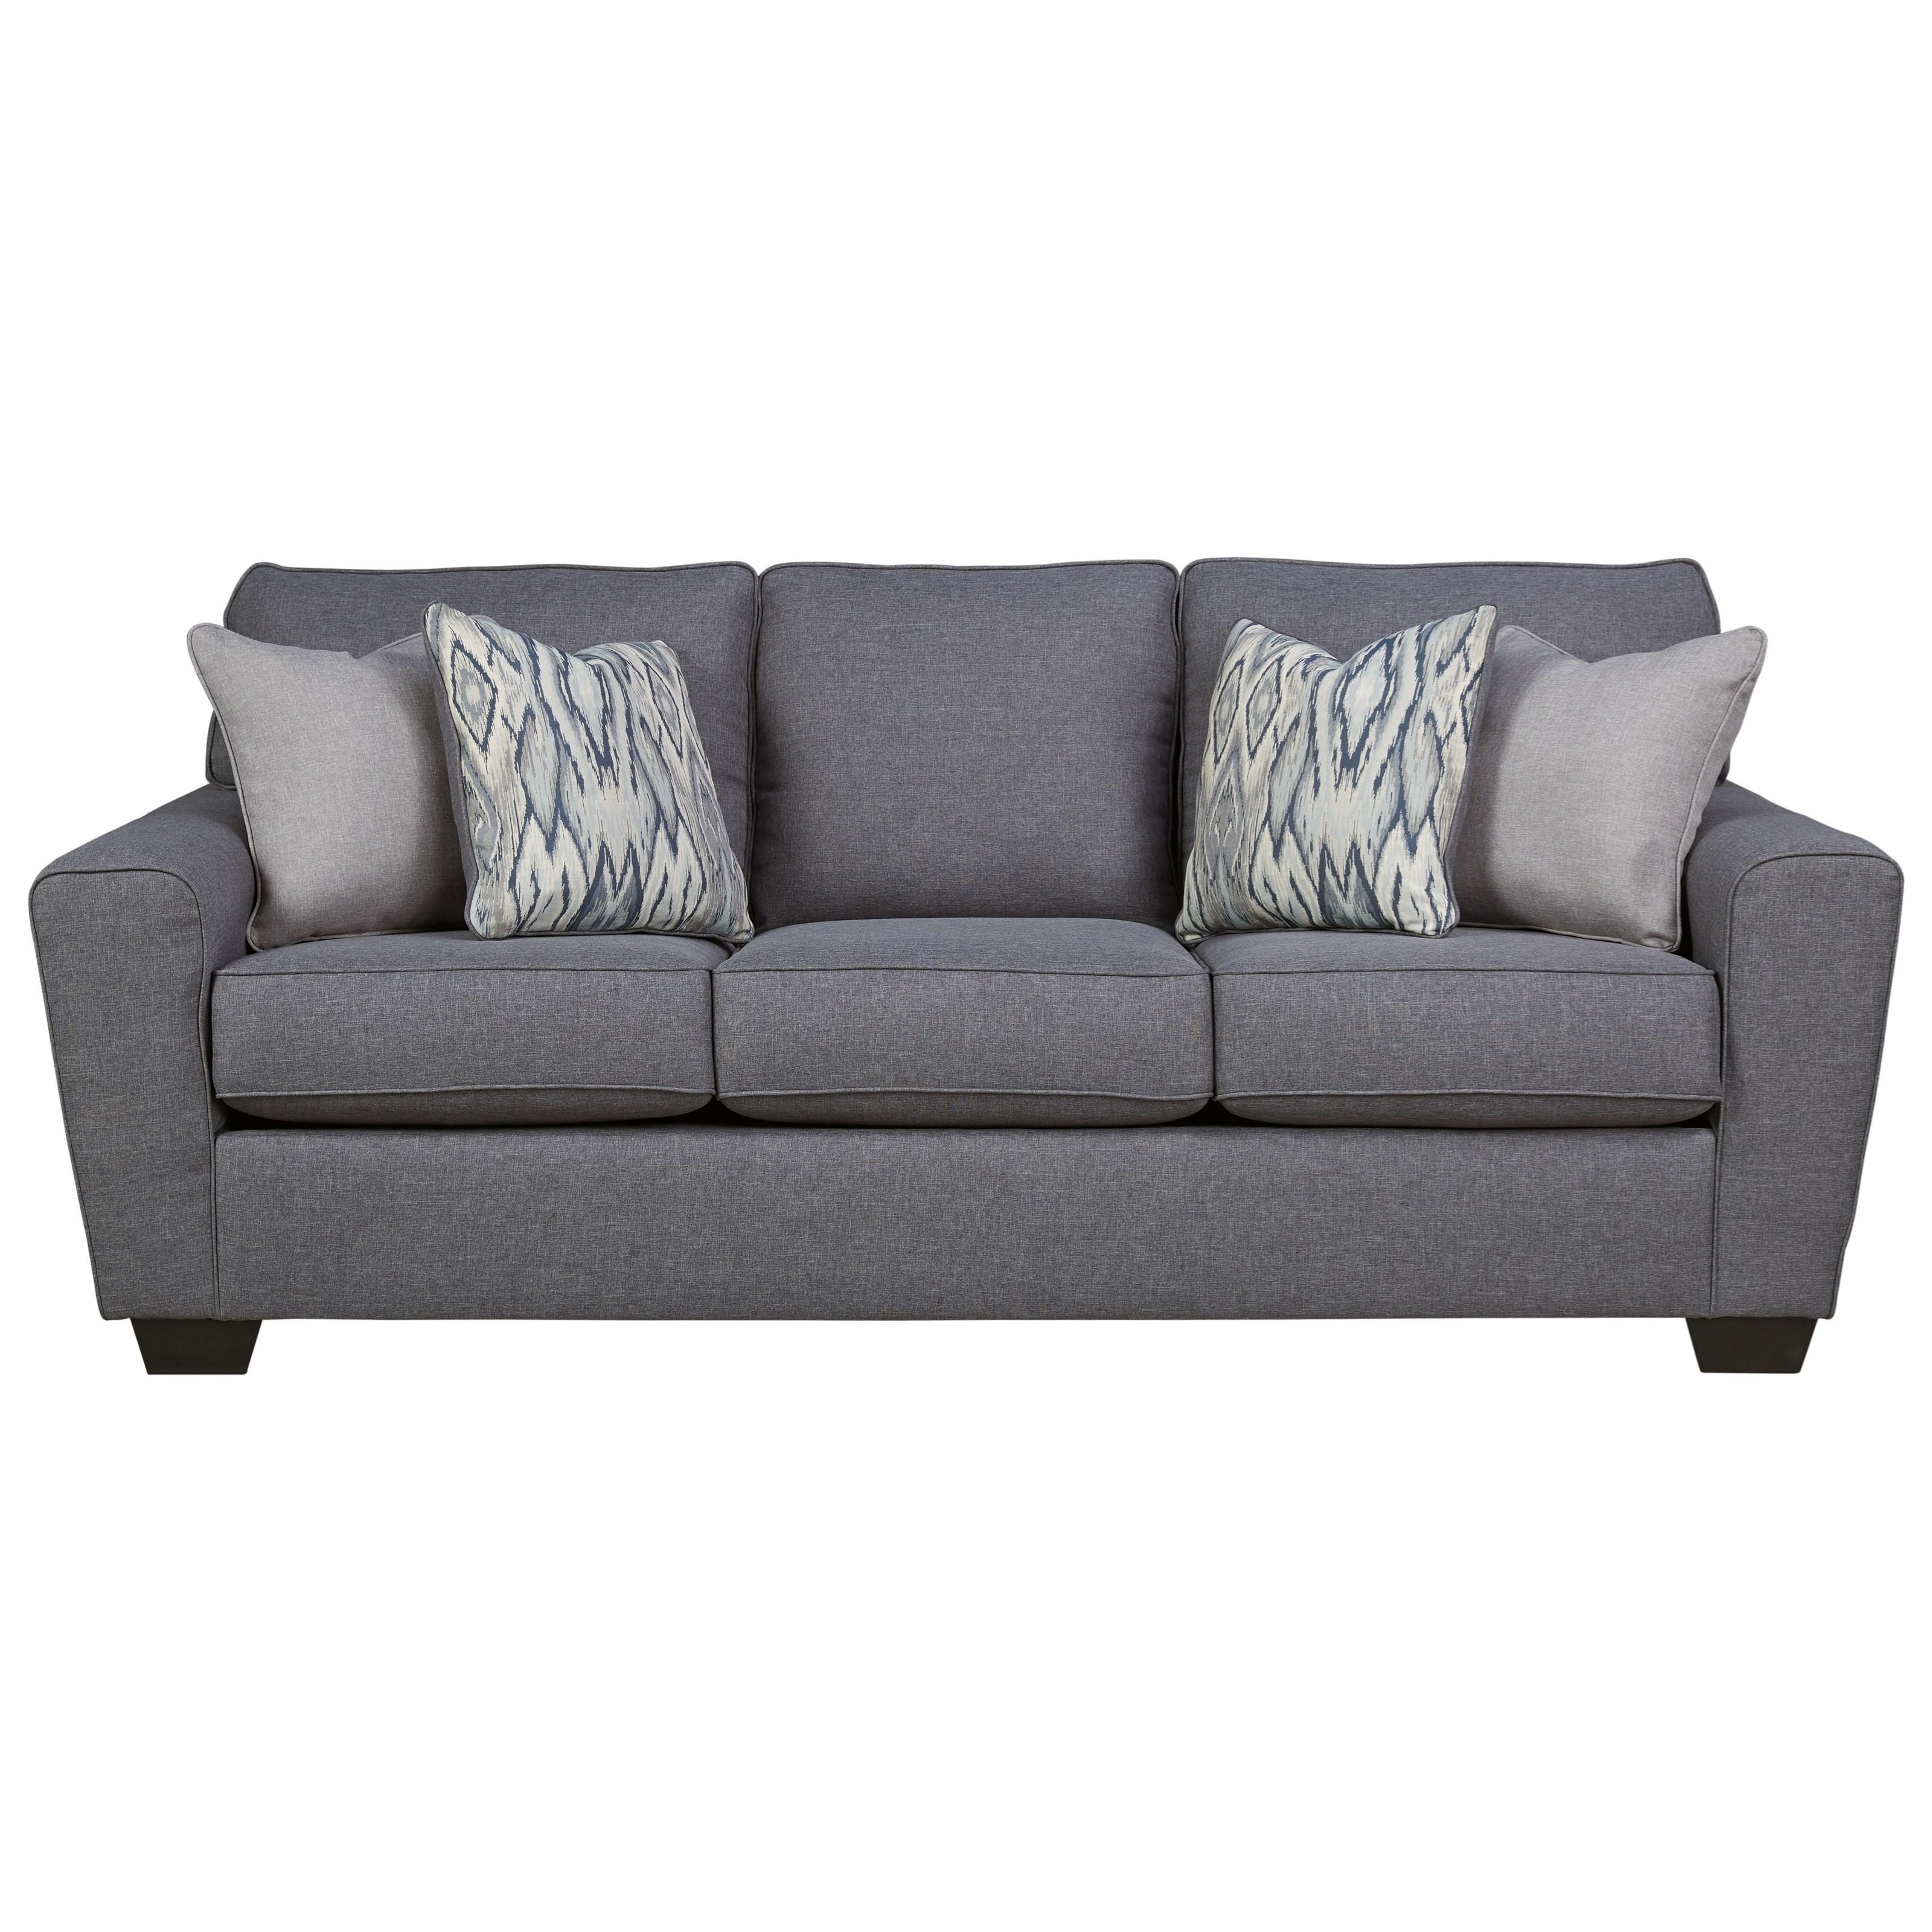 - Ashley Furniture Calion 2070239 Contemporary Queen Sofa Sleeper